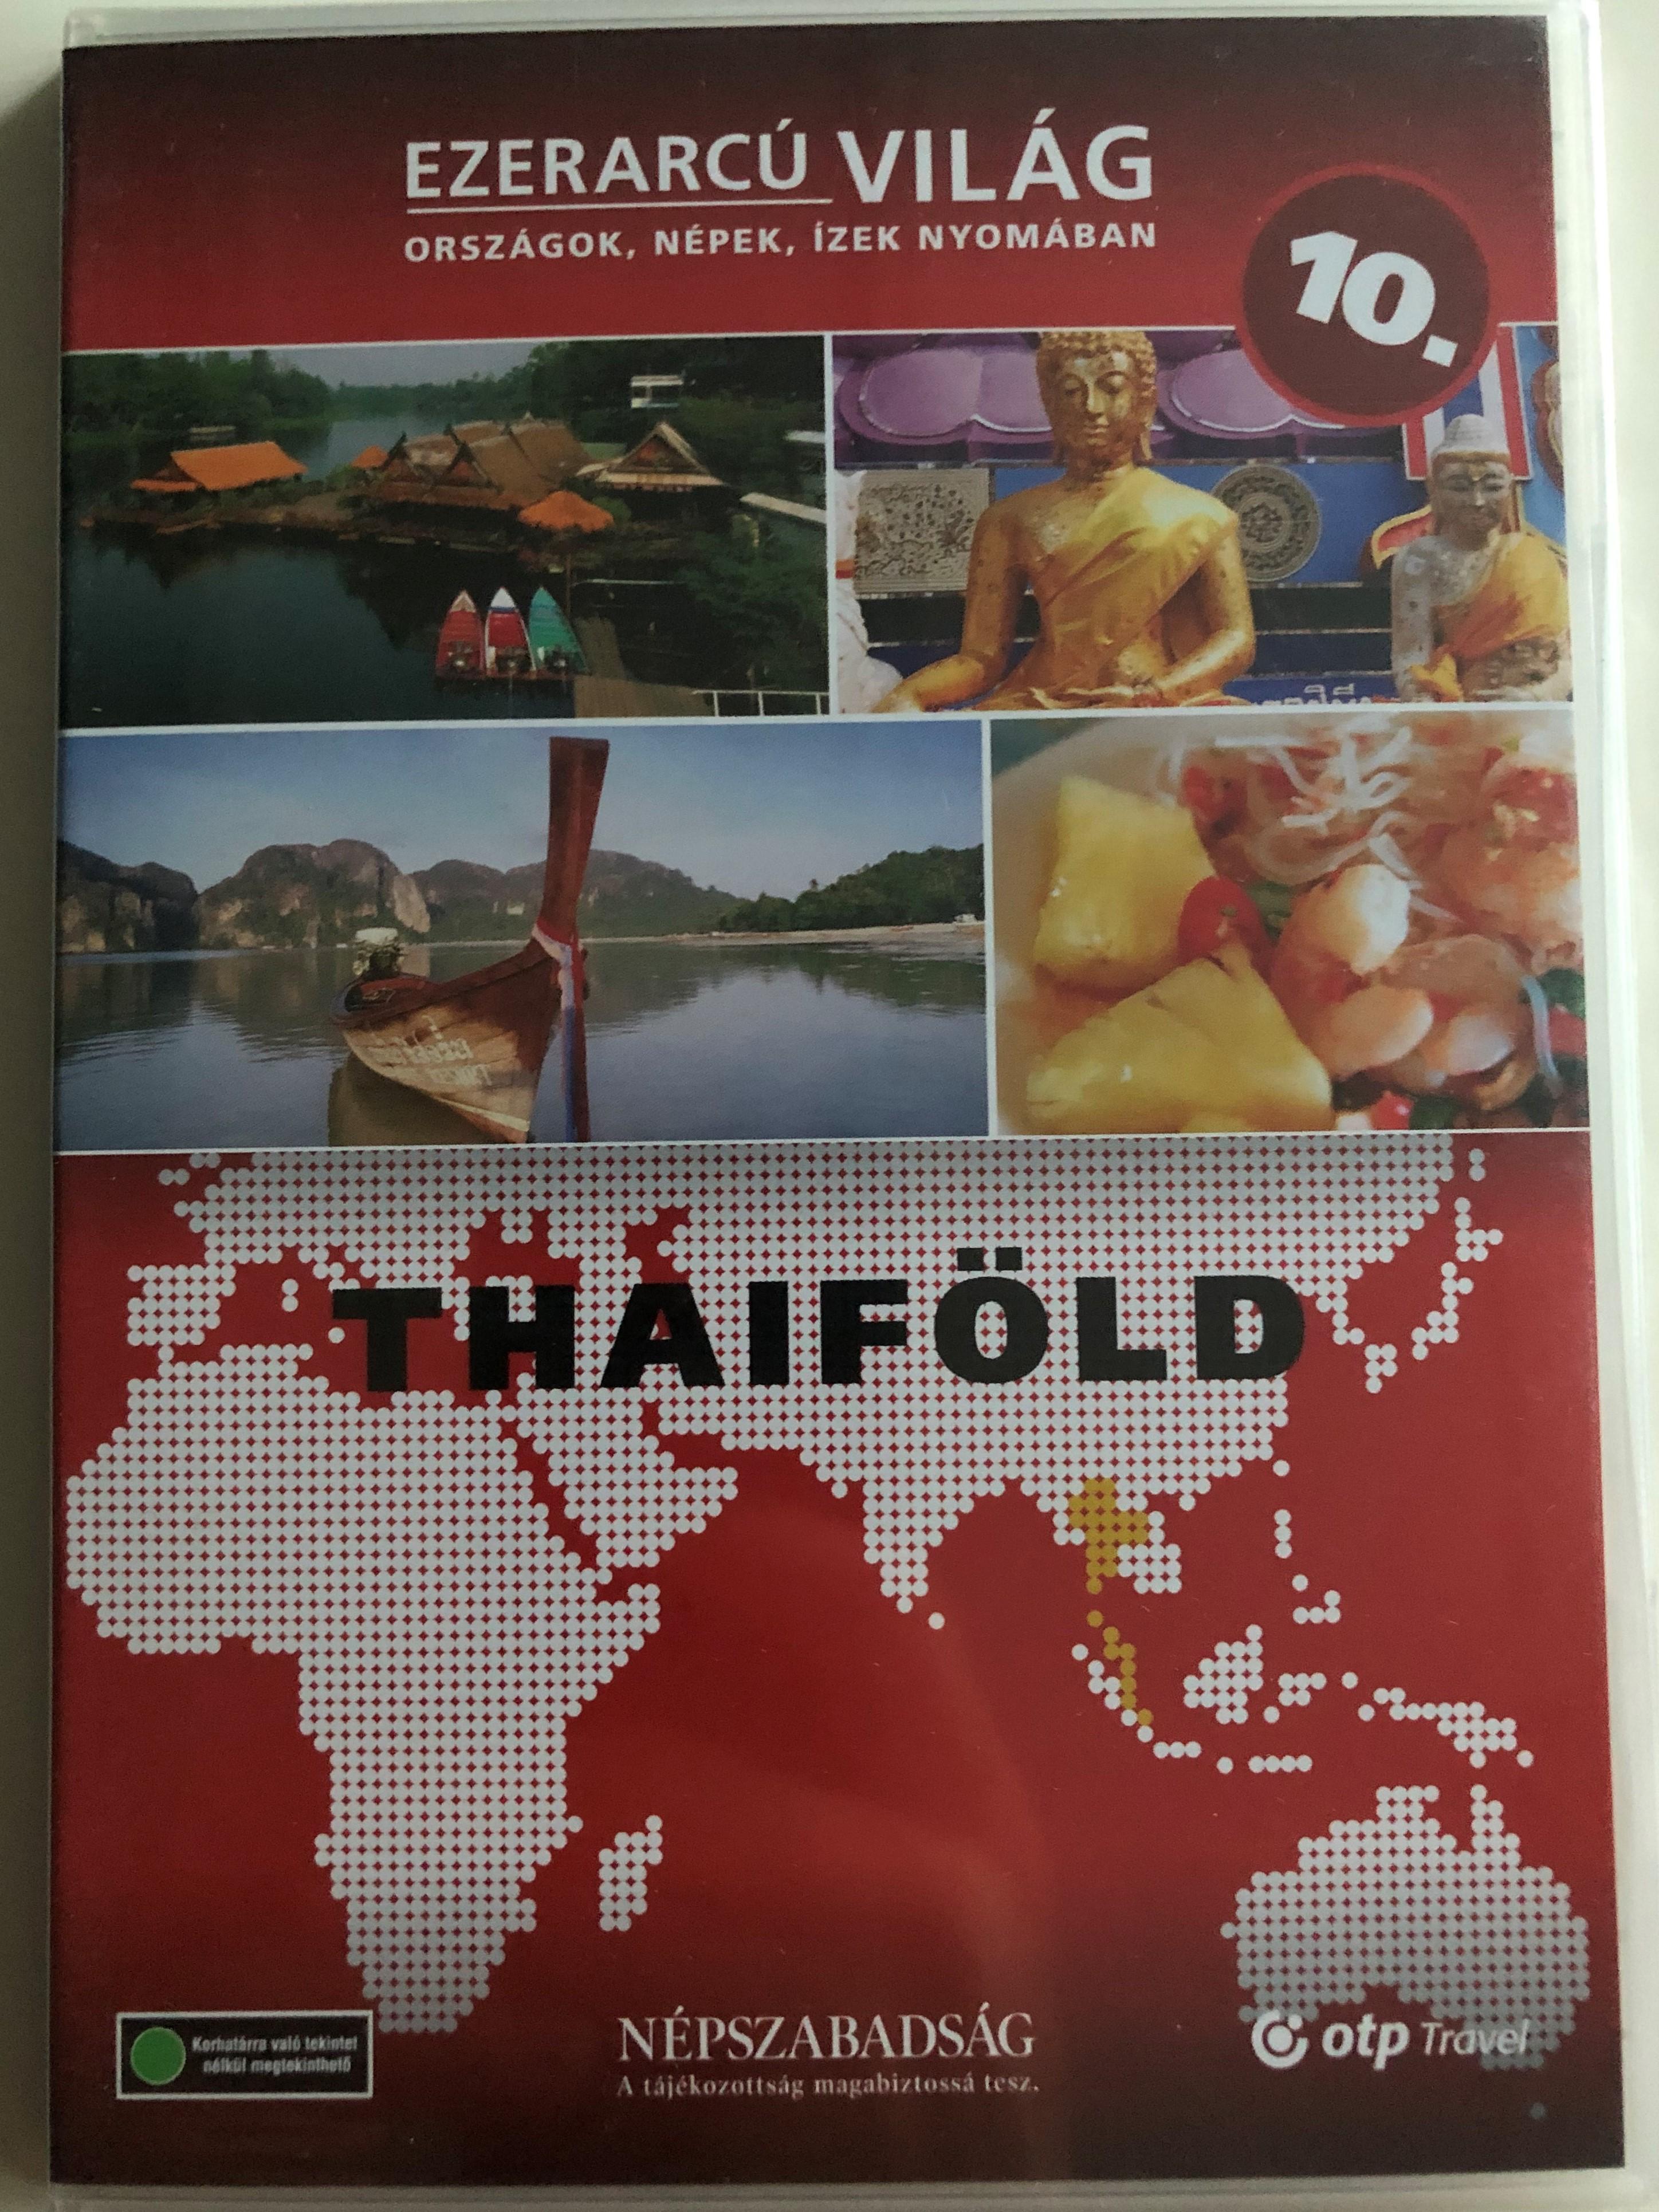 ezerarc-vil-g-vol.-10-thaif-ld-thailand-dvd-2009-orsz-gok-n-pek-zek-nyom-ban-20-x-dvd-set-2009-n-pszabads-g-premier-media-pilot-film-documentary-series-about-our-world-1-.jpg